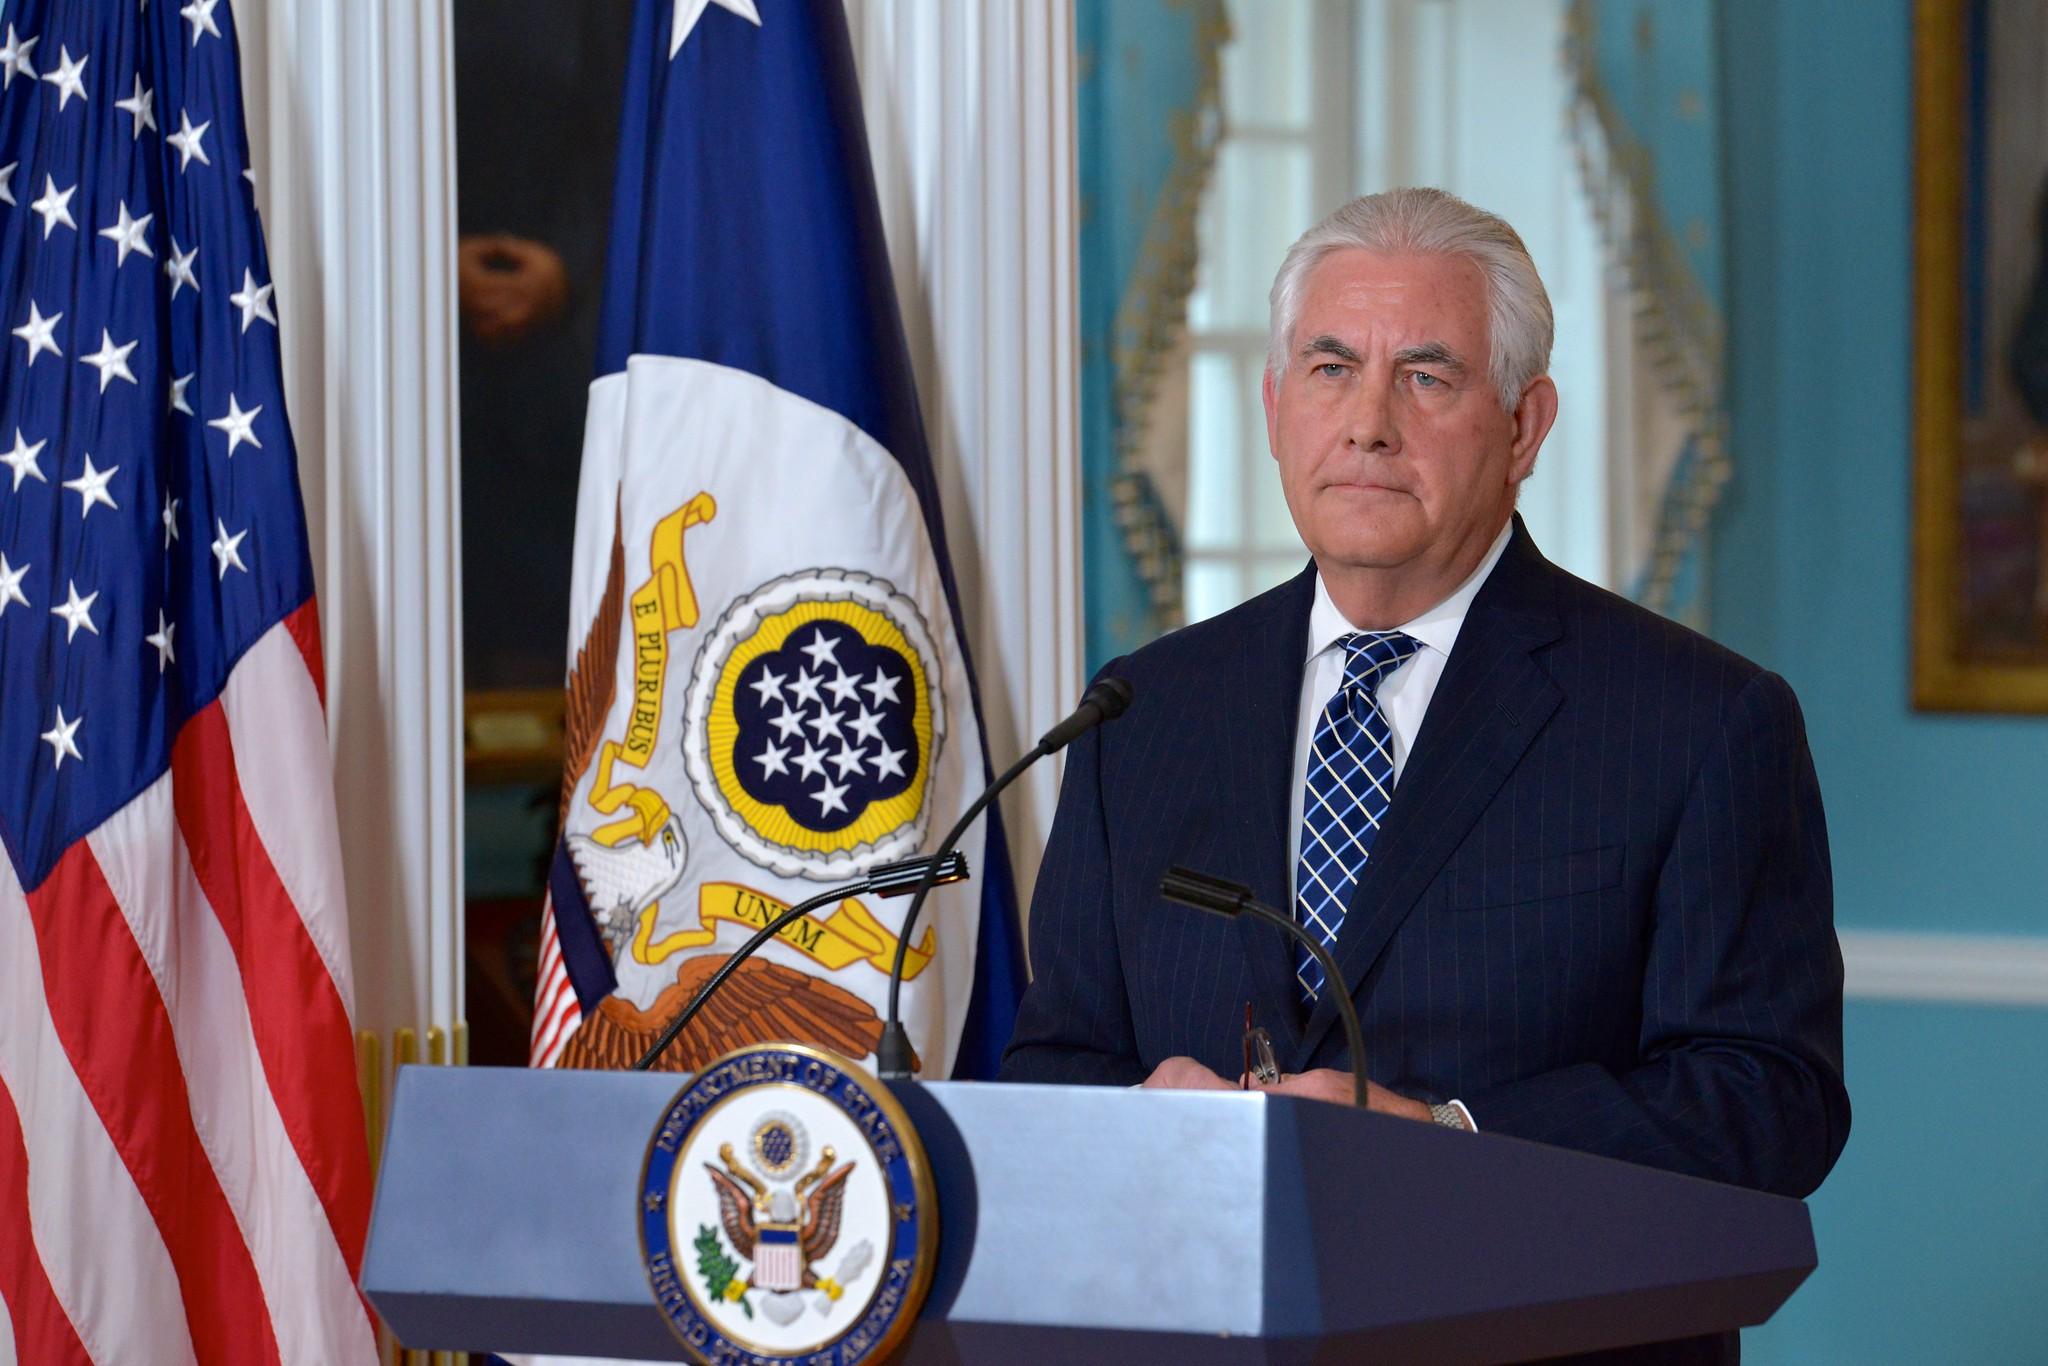 FITSNews – Rex Tillerson Rebukes Nikki Haley Over Allegations He Undermined Donald Trump